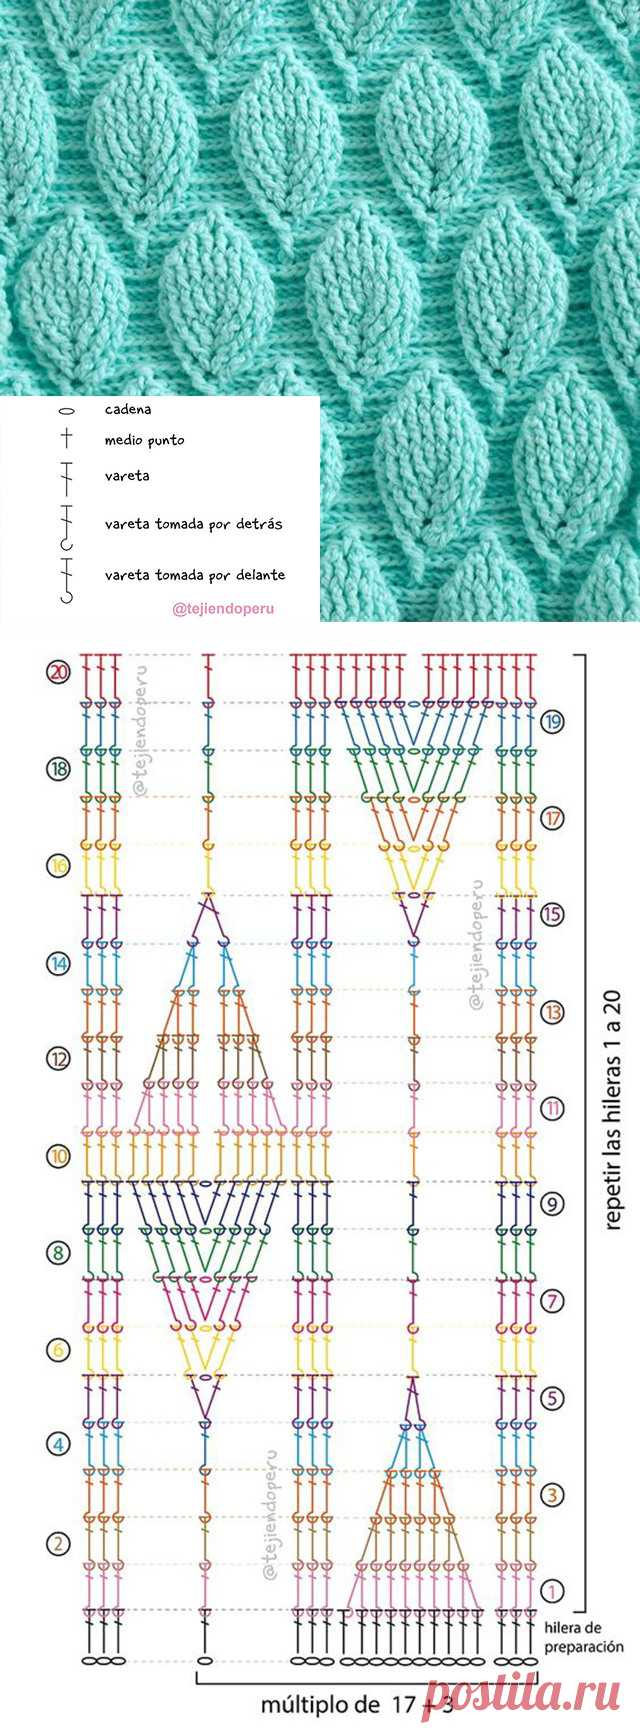 Leaf Stitch Crochet Pattern Tutorial | CrochetBeja